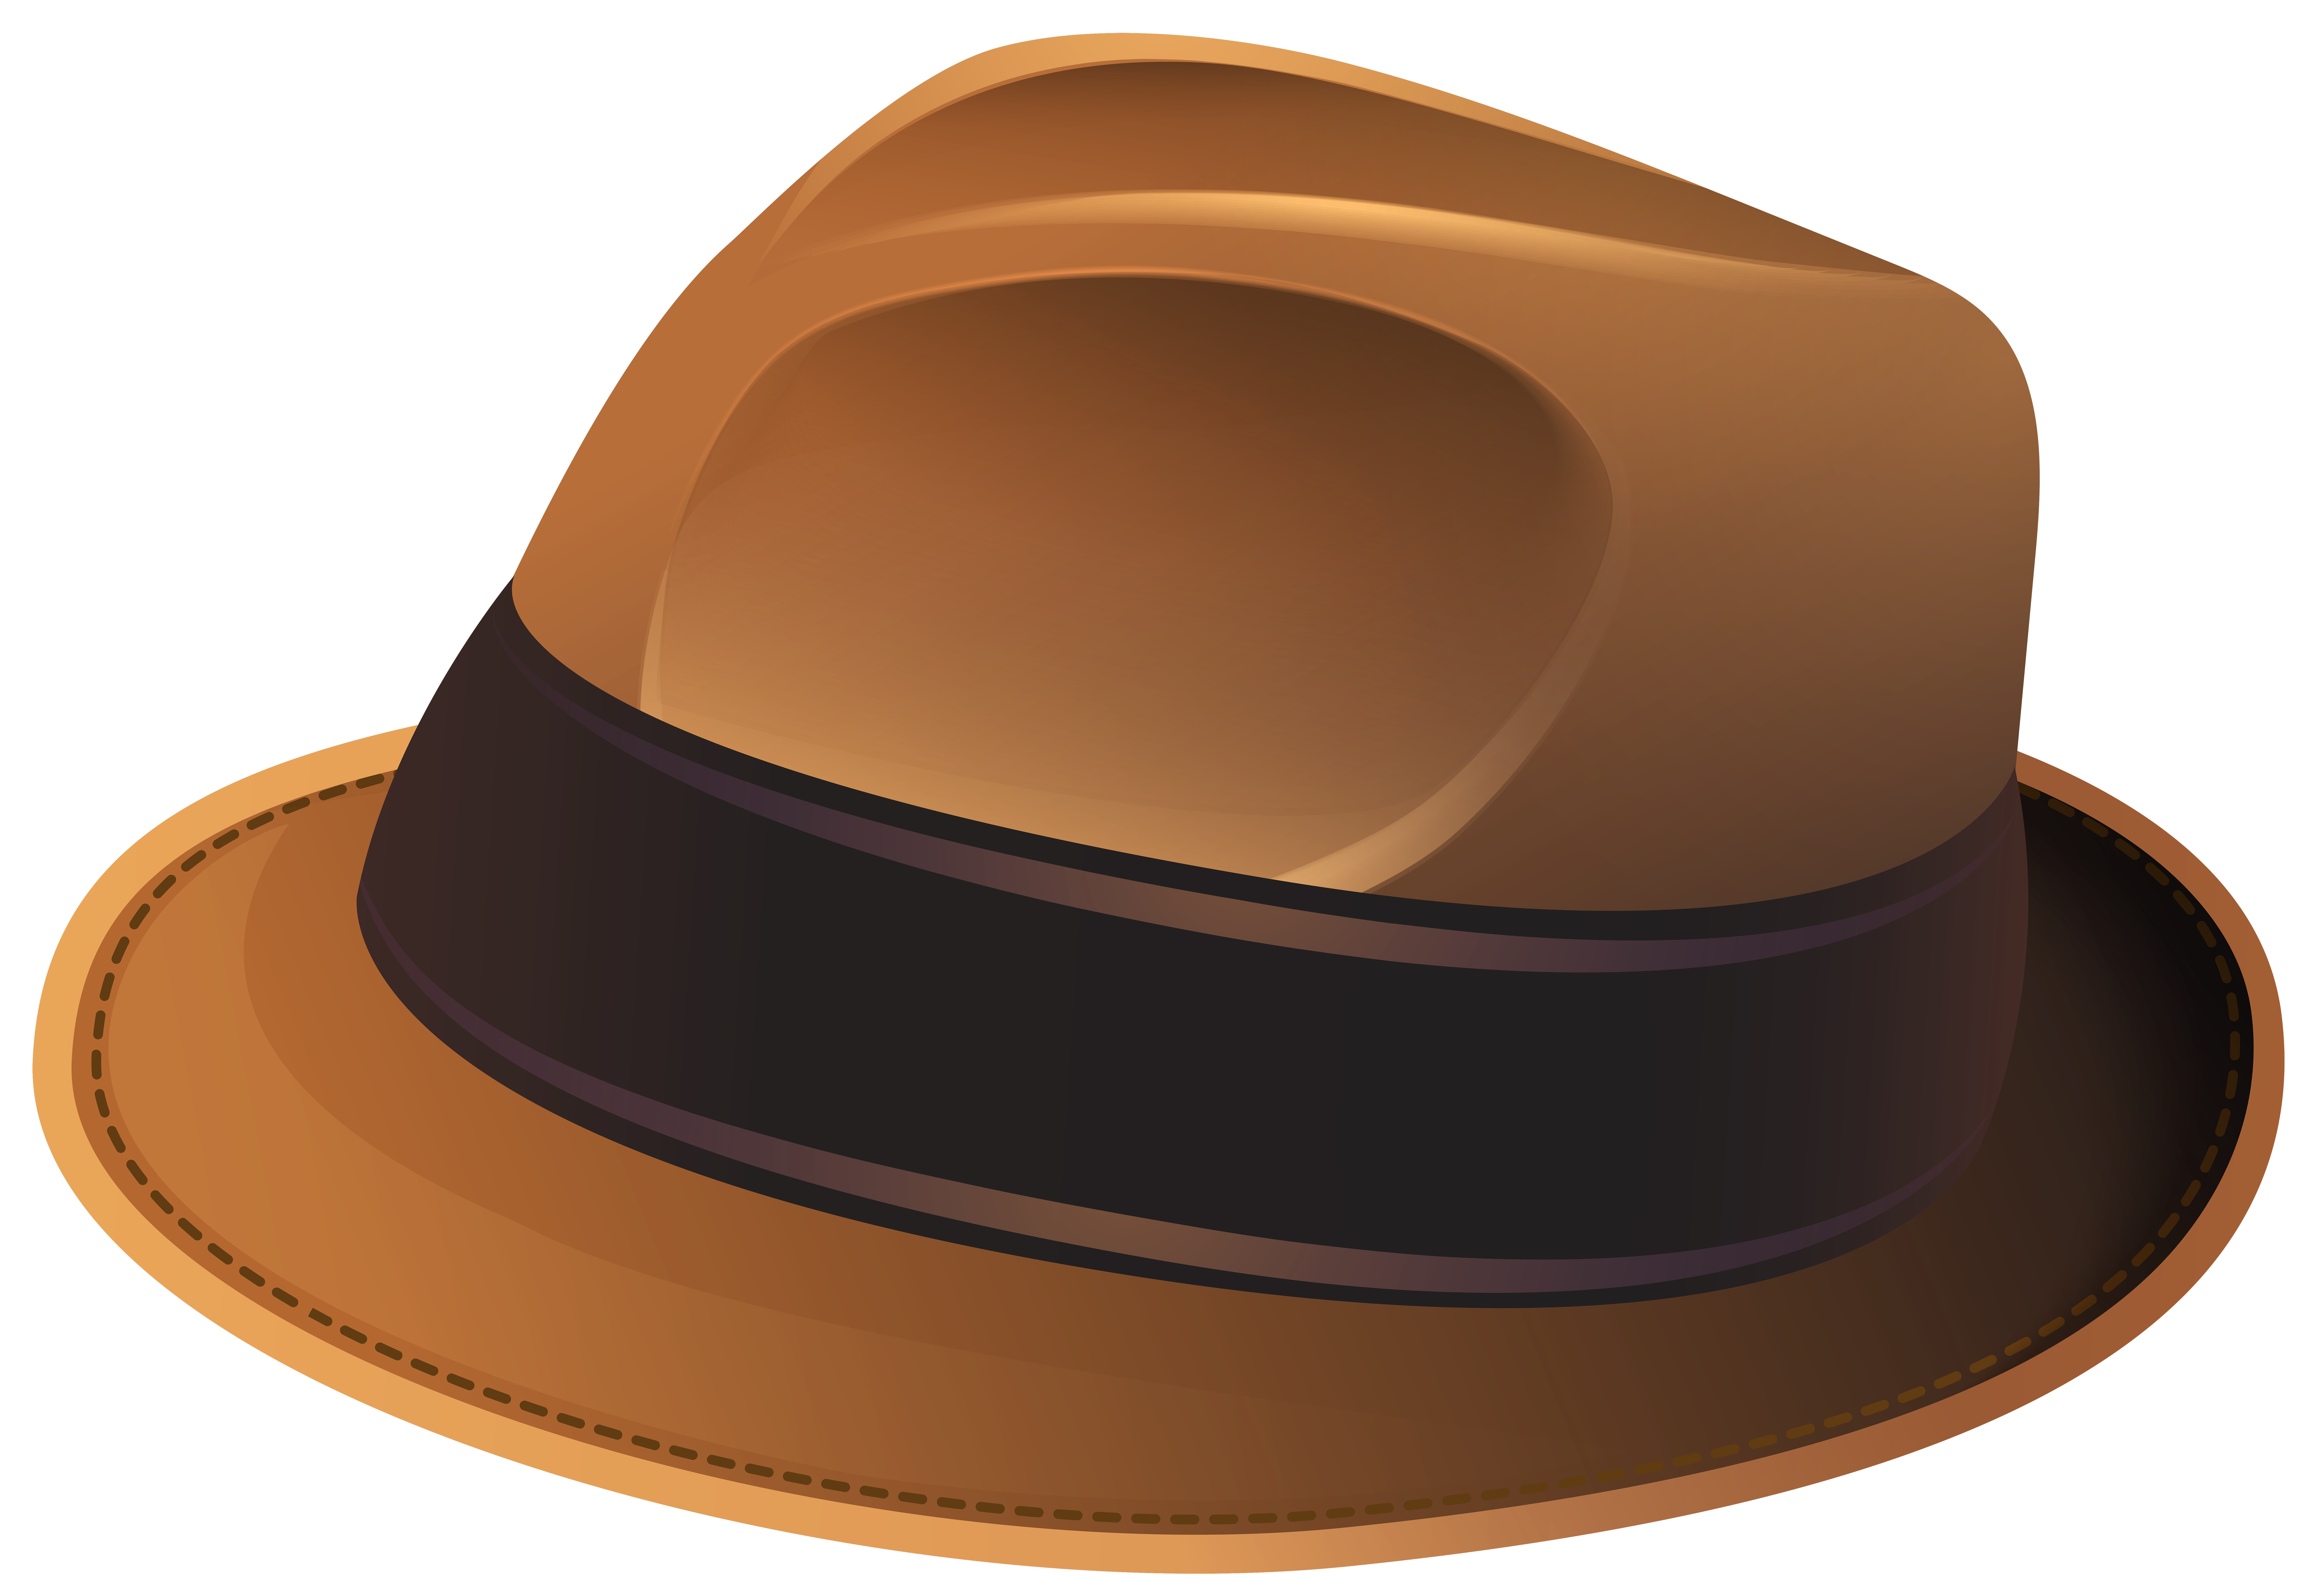 Clipart hat transparent background. Brown png clip art